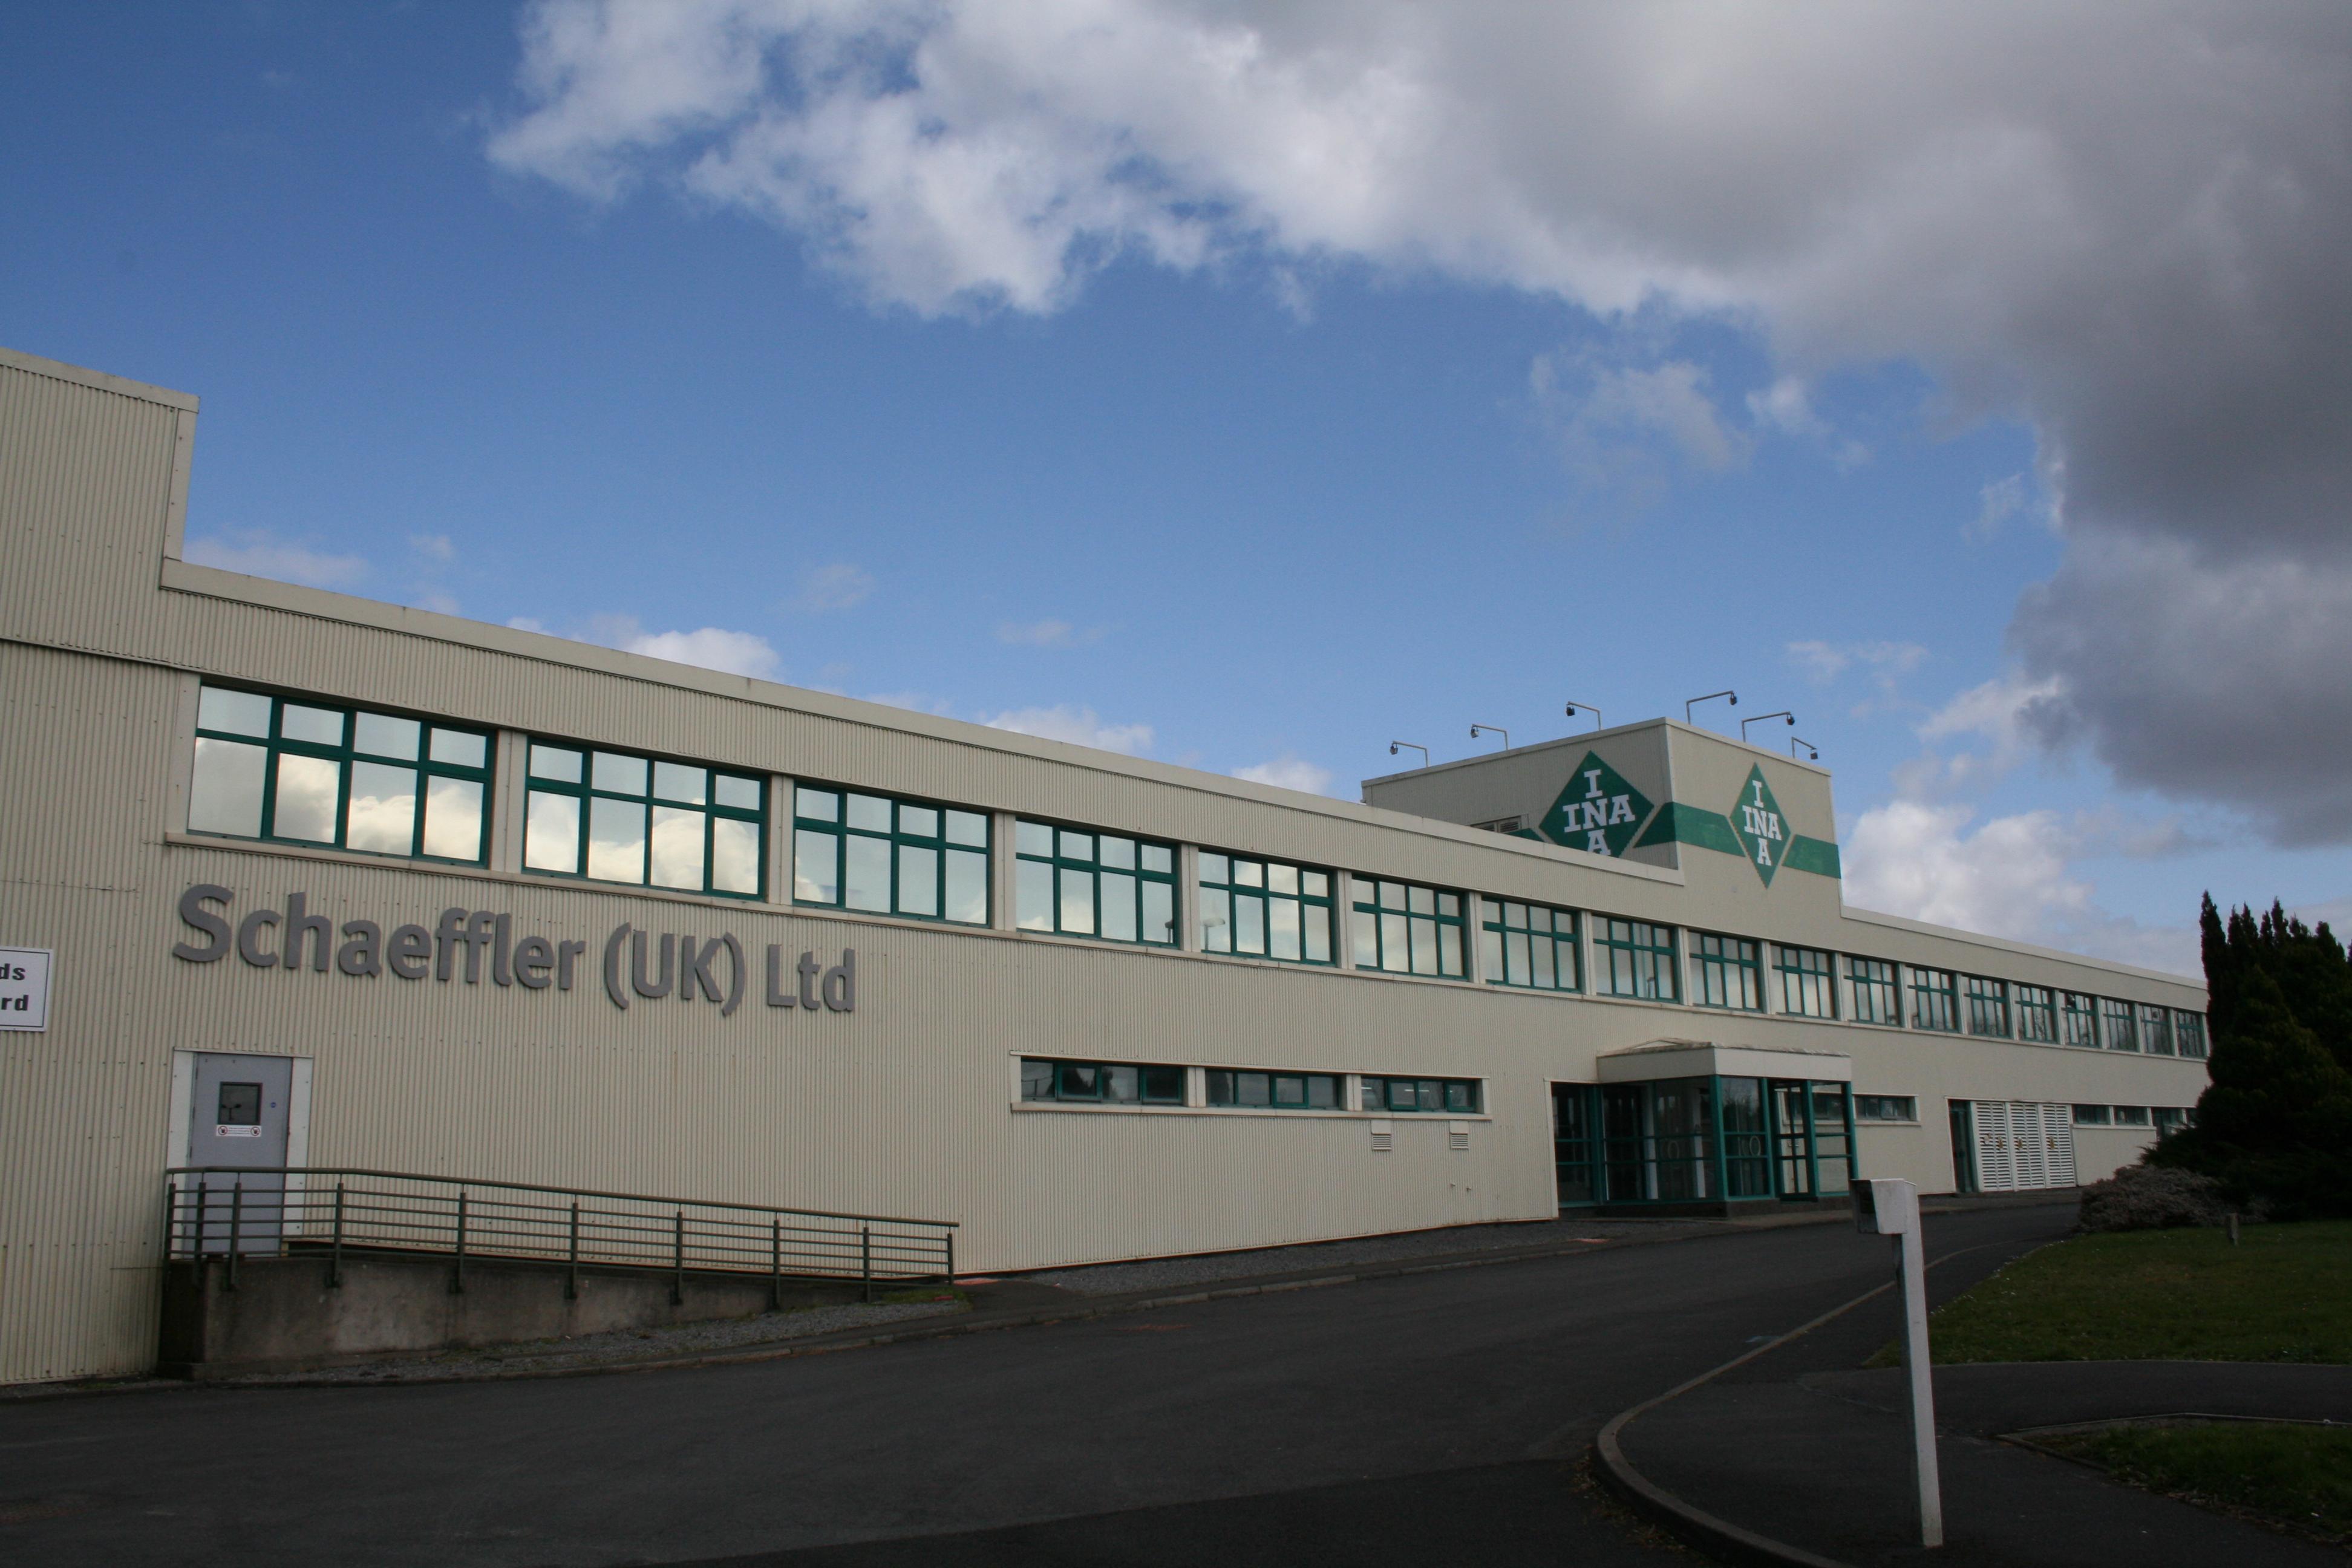 Schaeffler zatvara dve fabrike u Velikoj Britaniji zbog Brexita